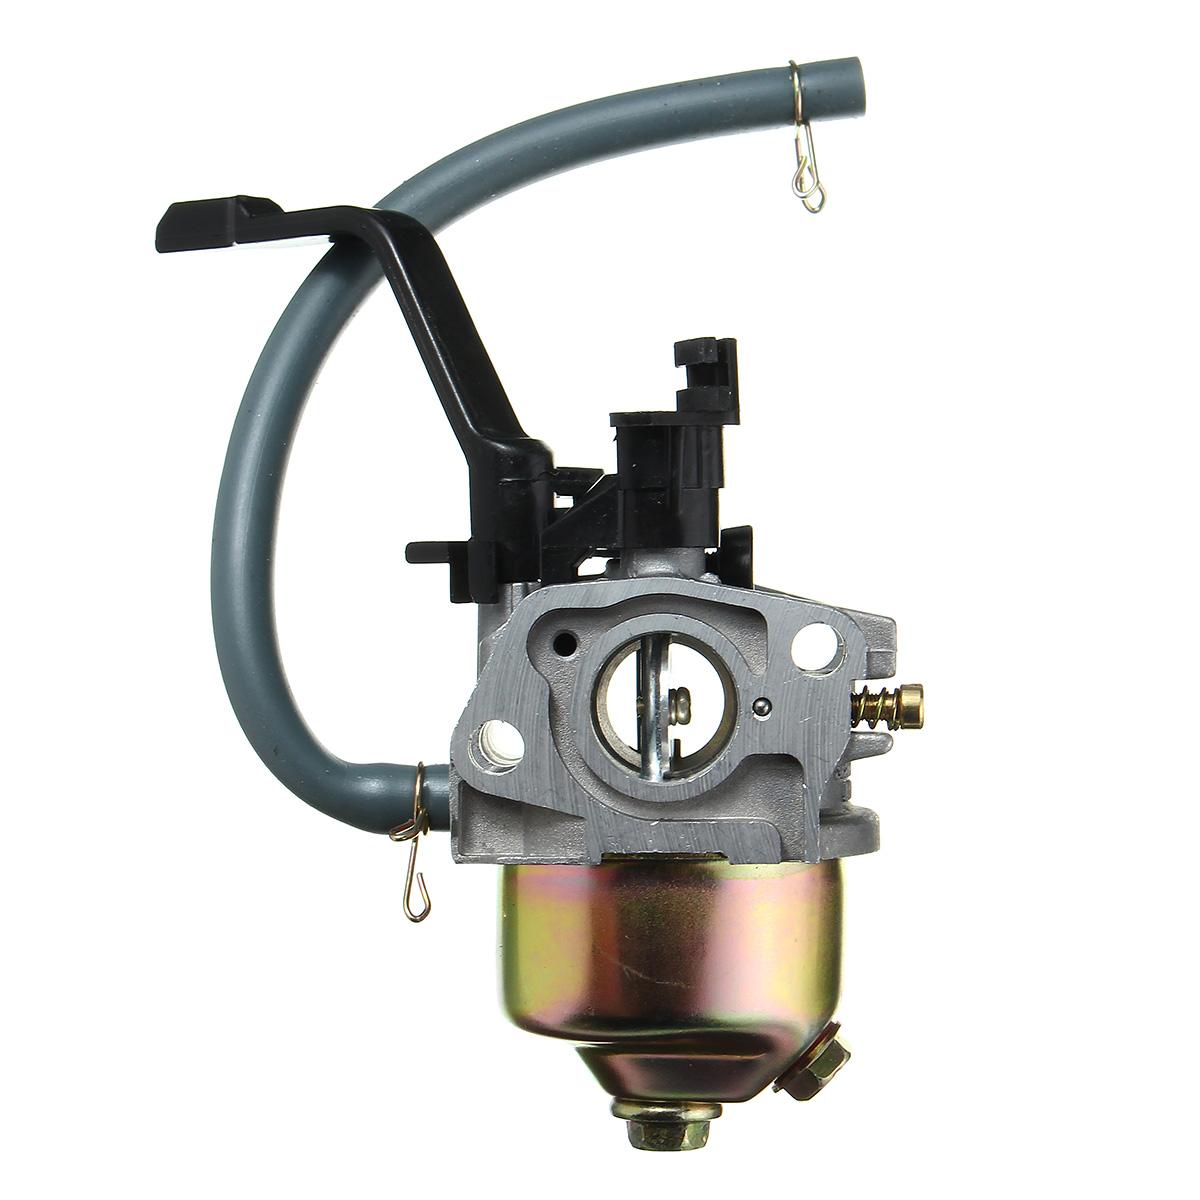 gx160 gx200 engine motor generator carburetor. Black Bedroom Furniture Sets. Home Design Ideas